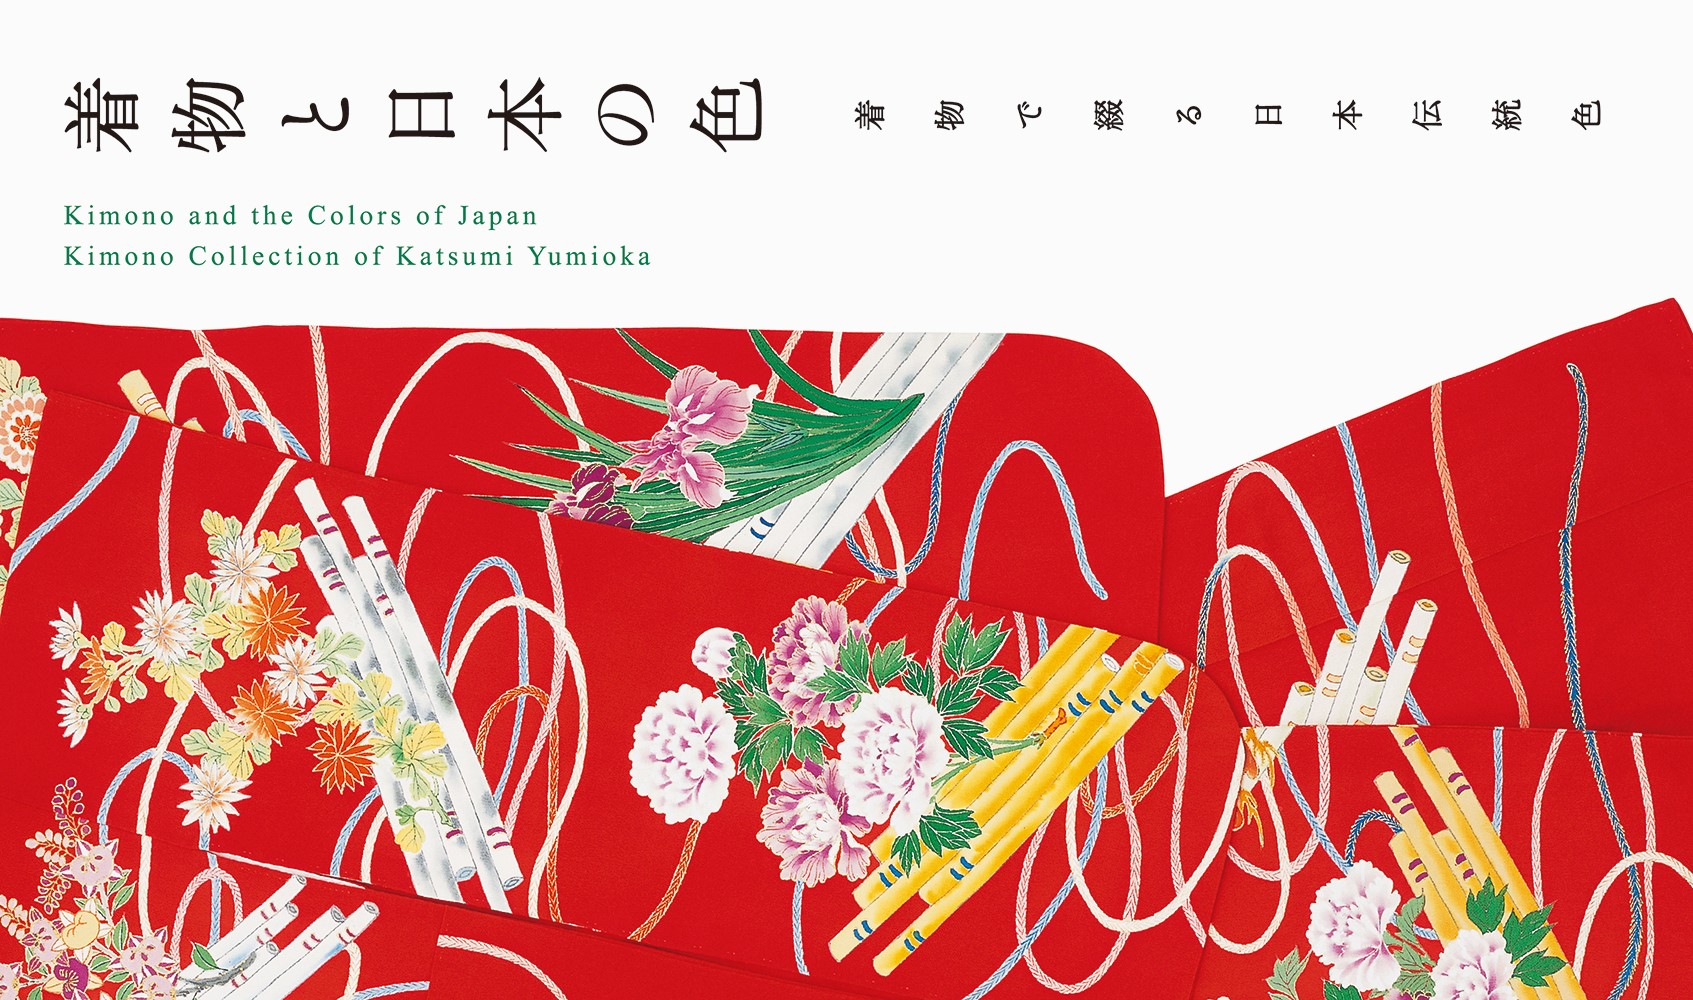 Read: Exploring Japan via Color and Kimono